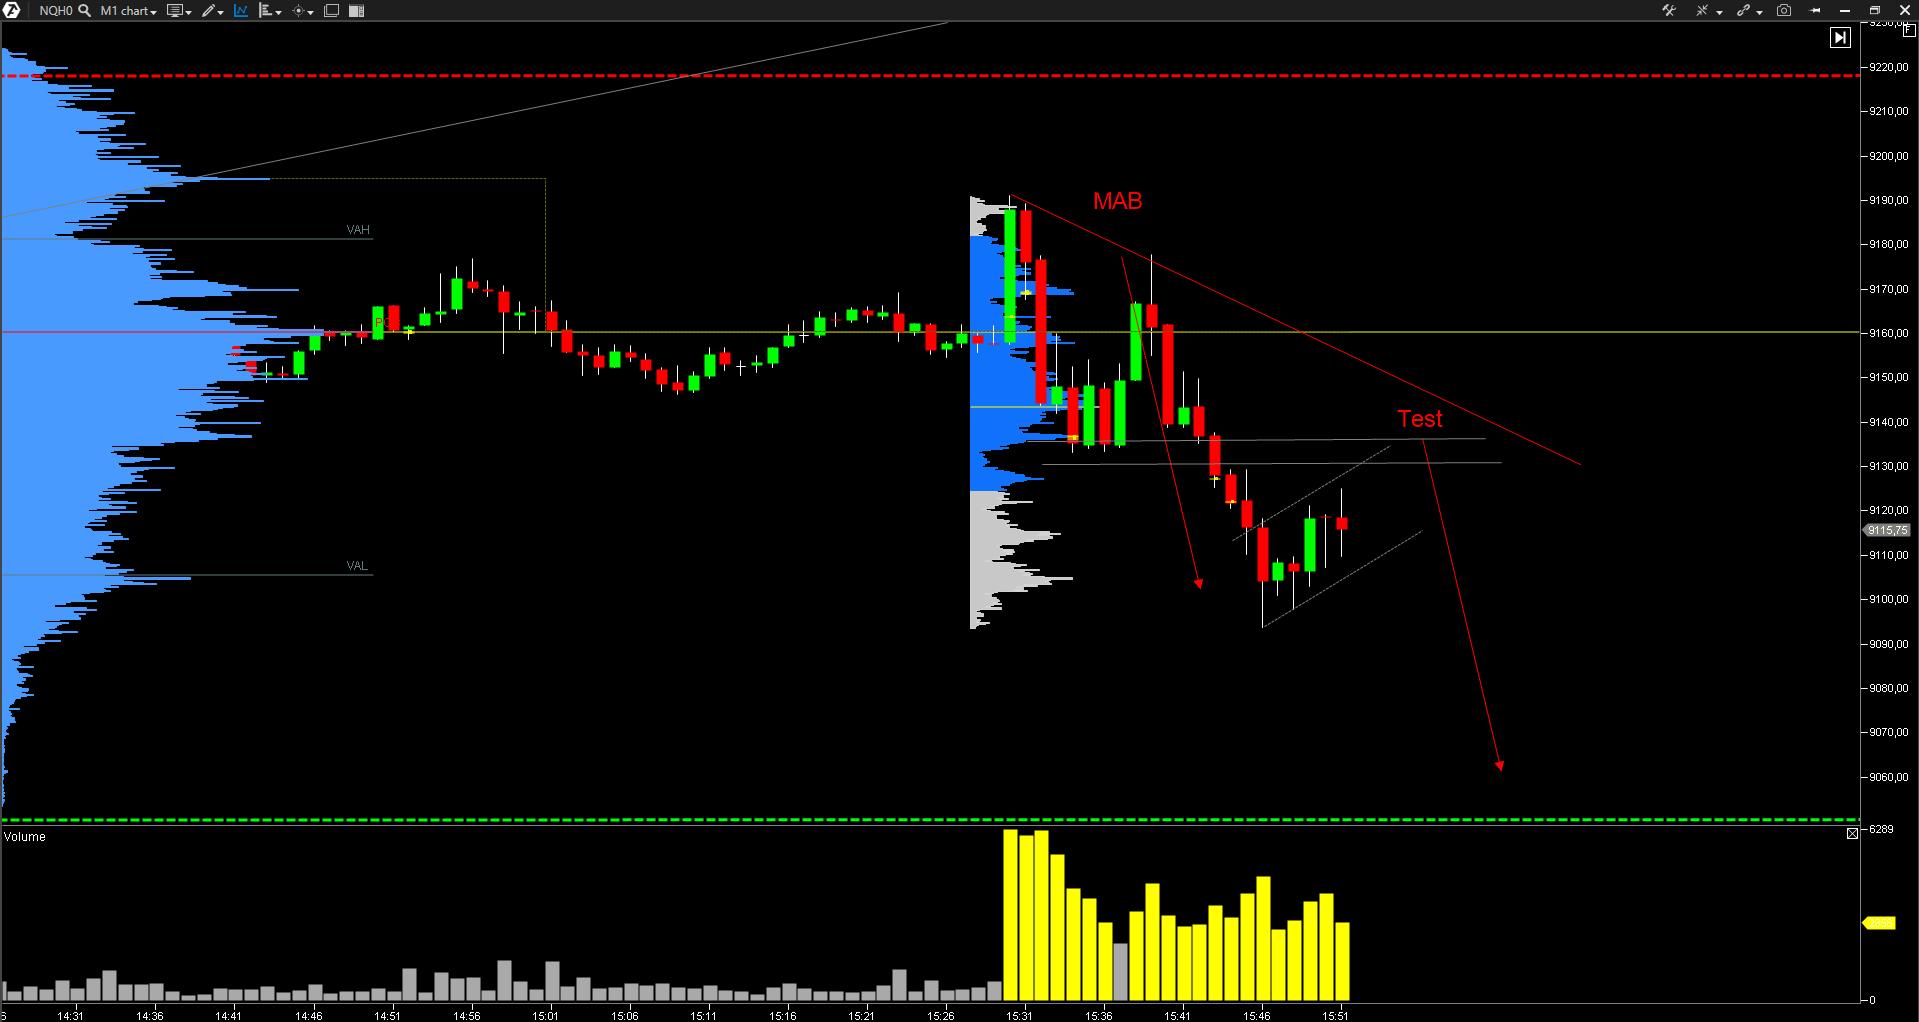 Estrategias de Trading Avanzadas - Enric Jaimez - unespeculador.com